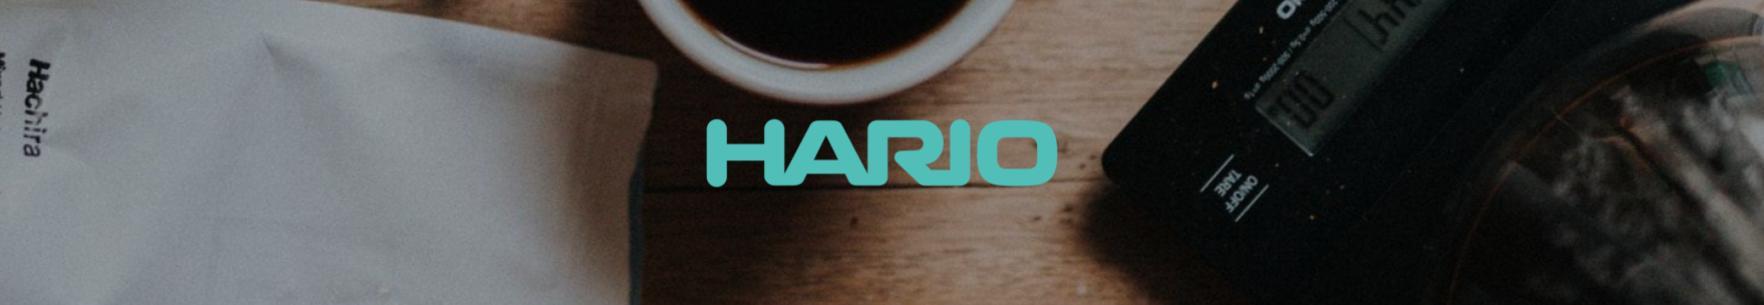 Hario vægte til kaffebryg